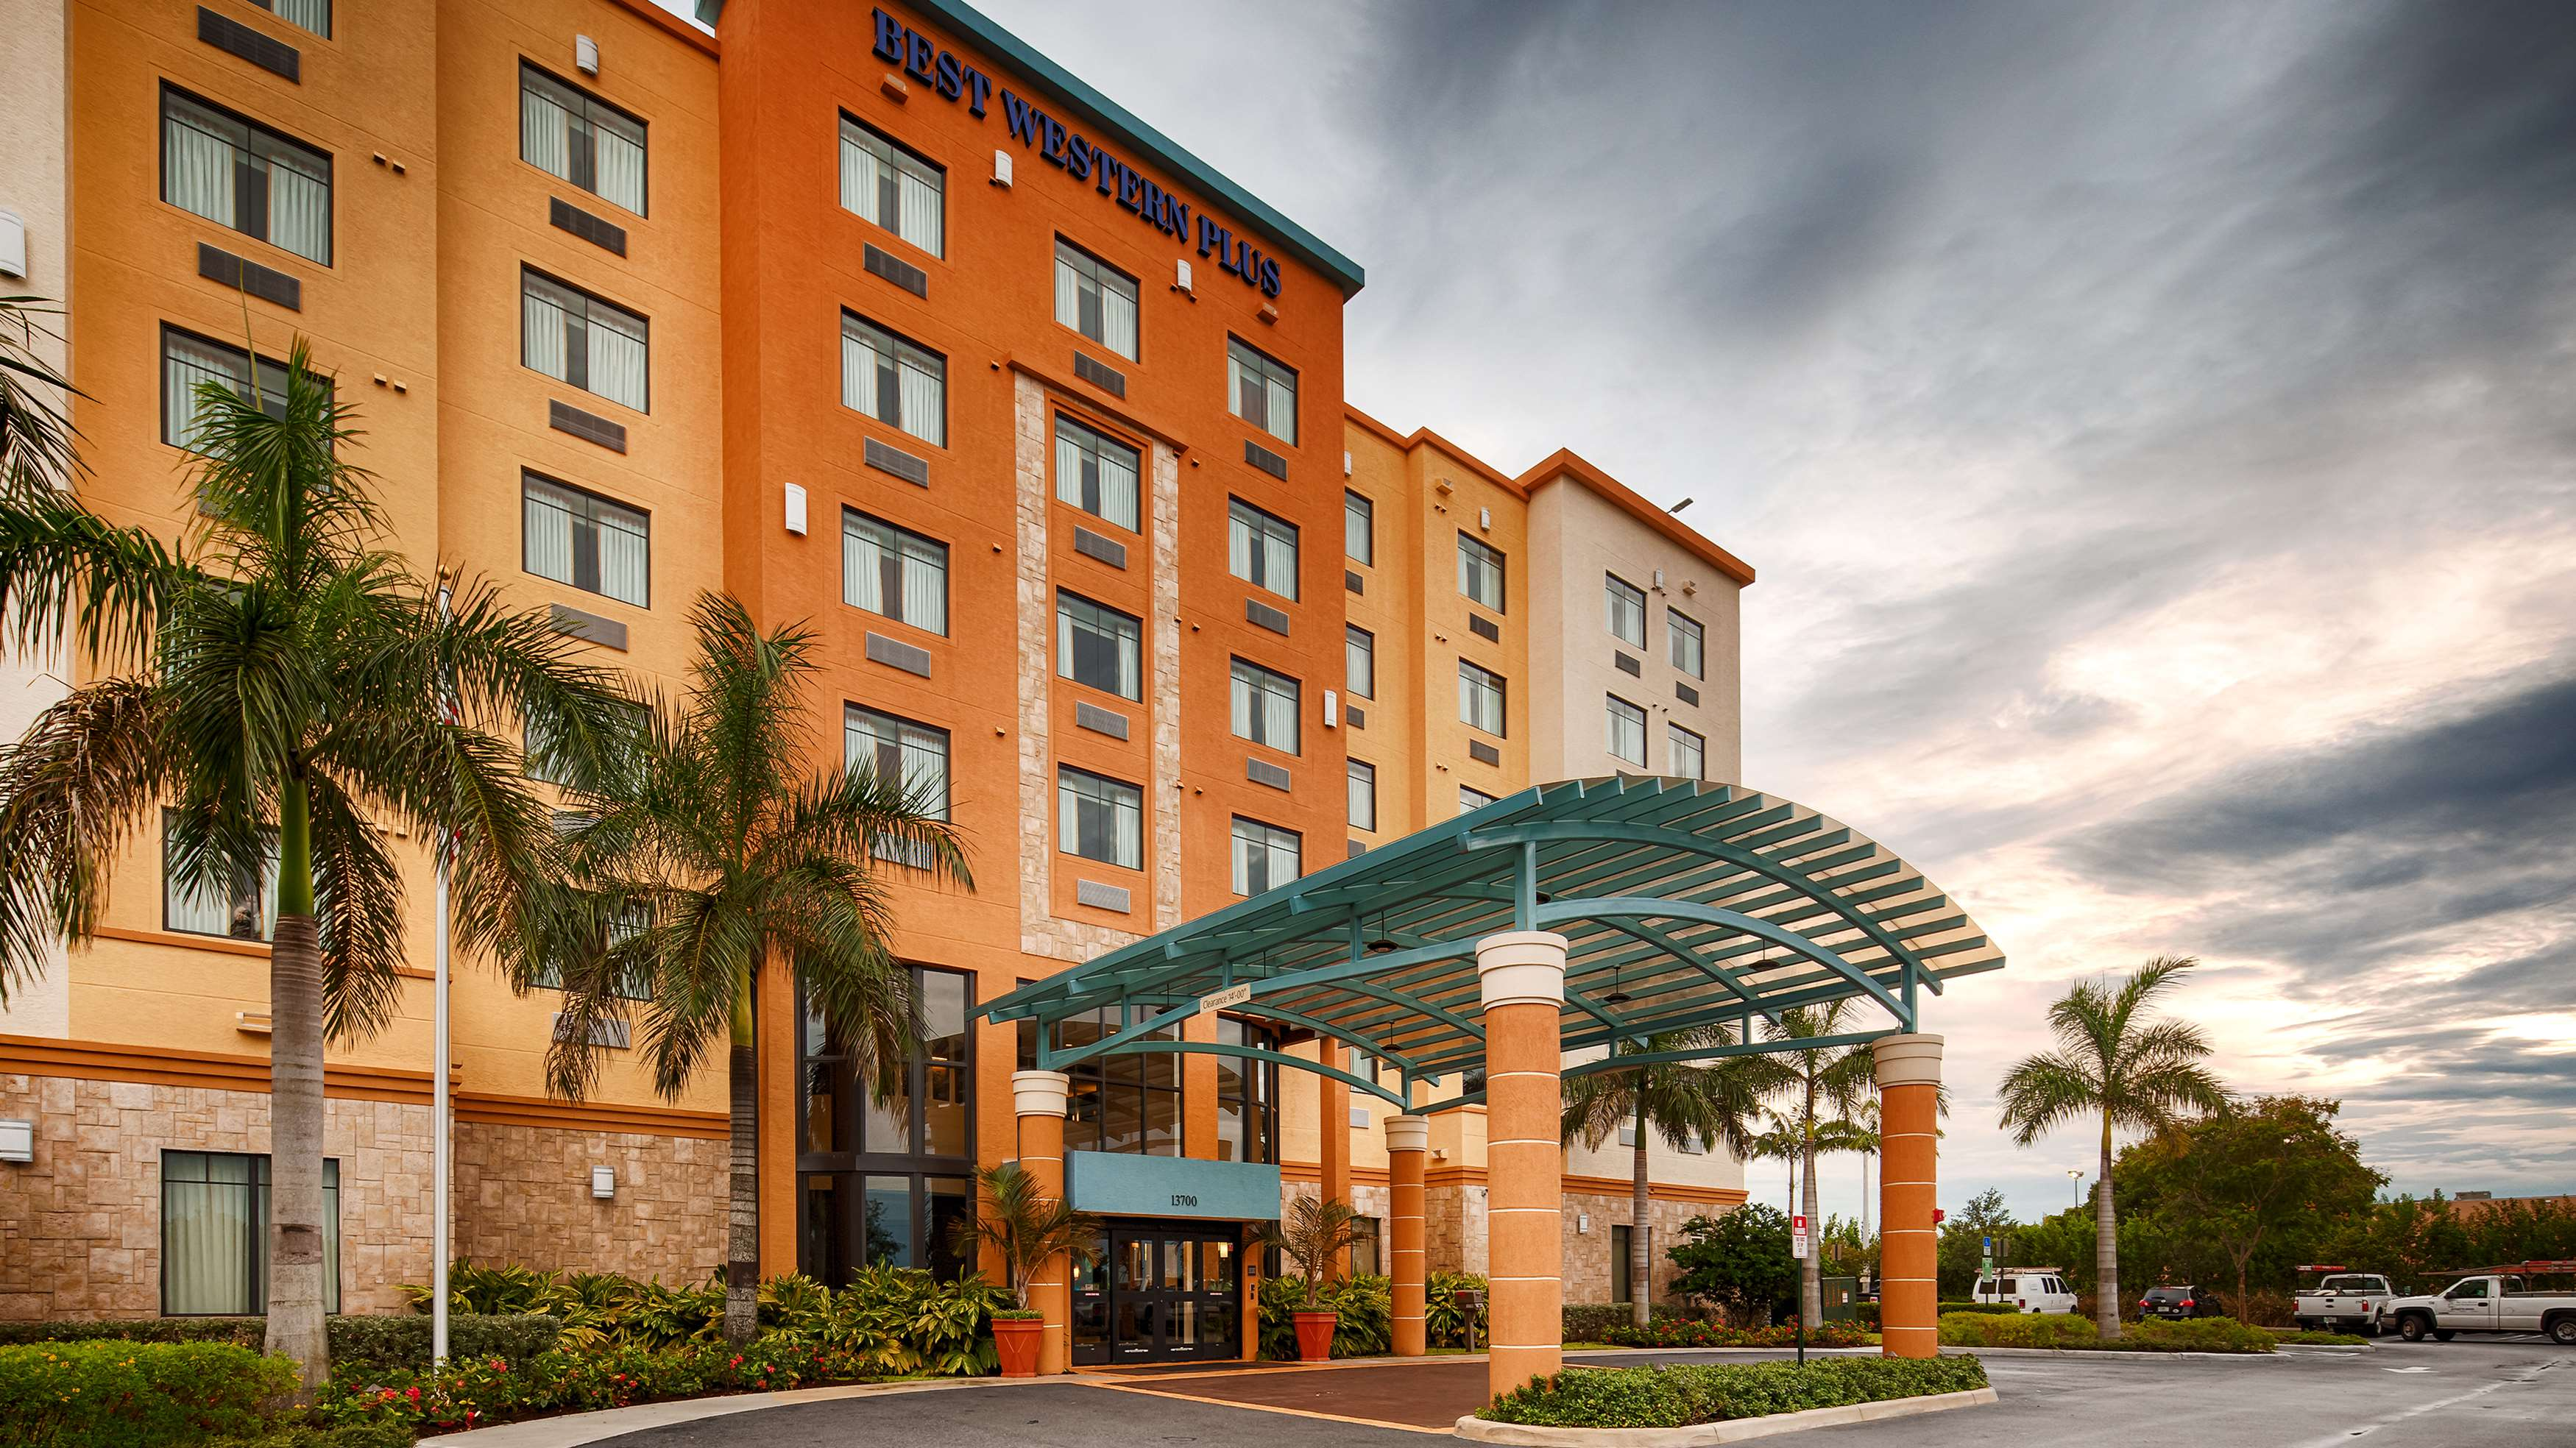 Best Western Plus Kendall Airport Hotel & Suites image 0